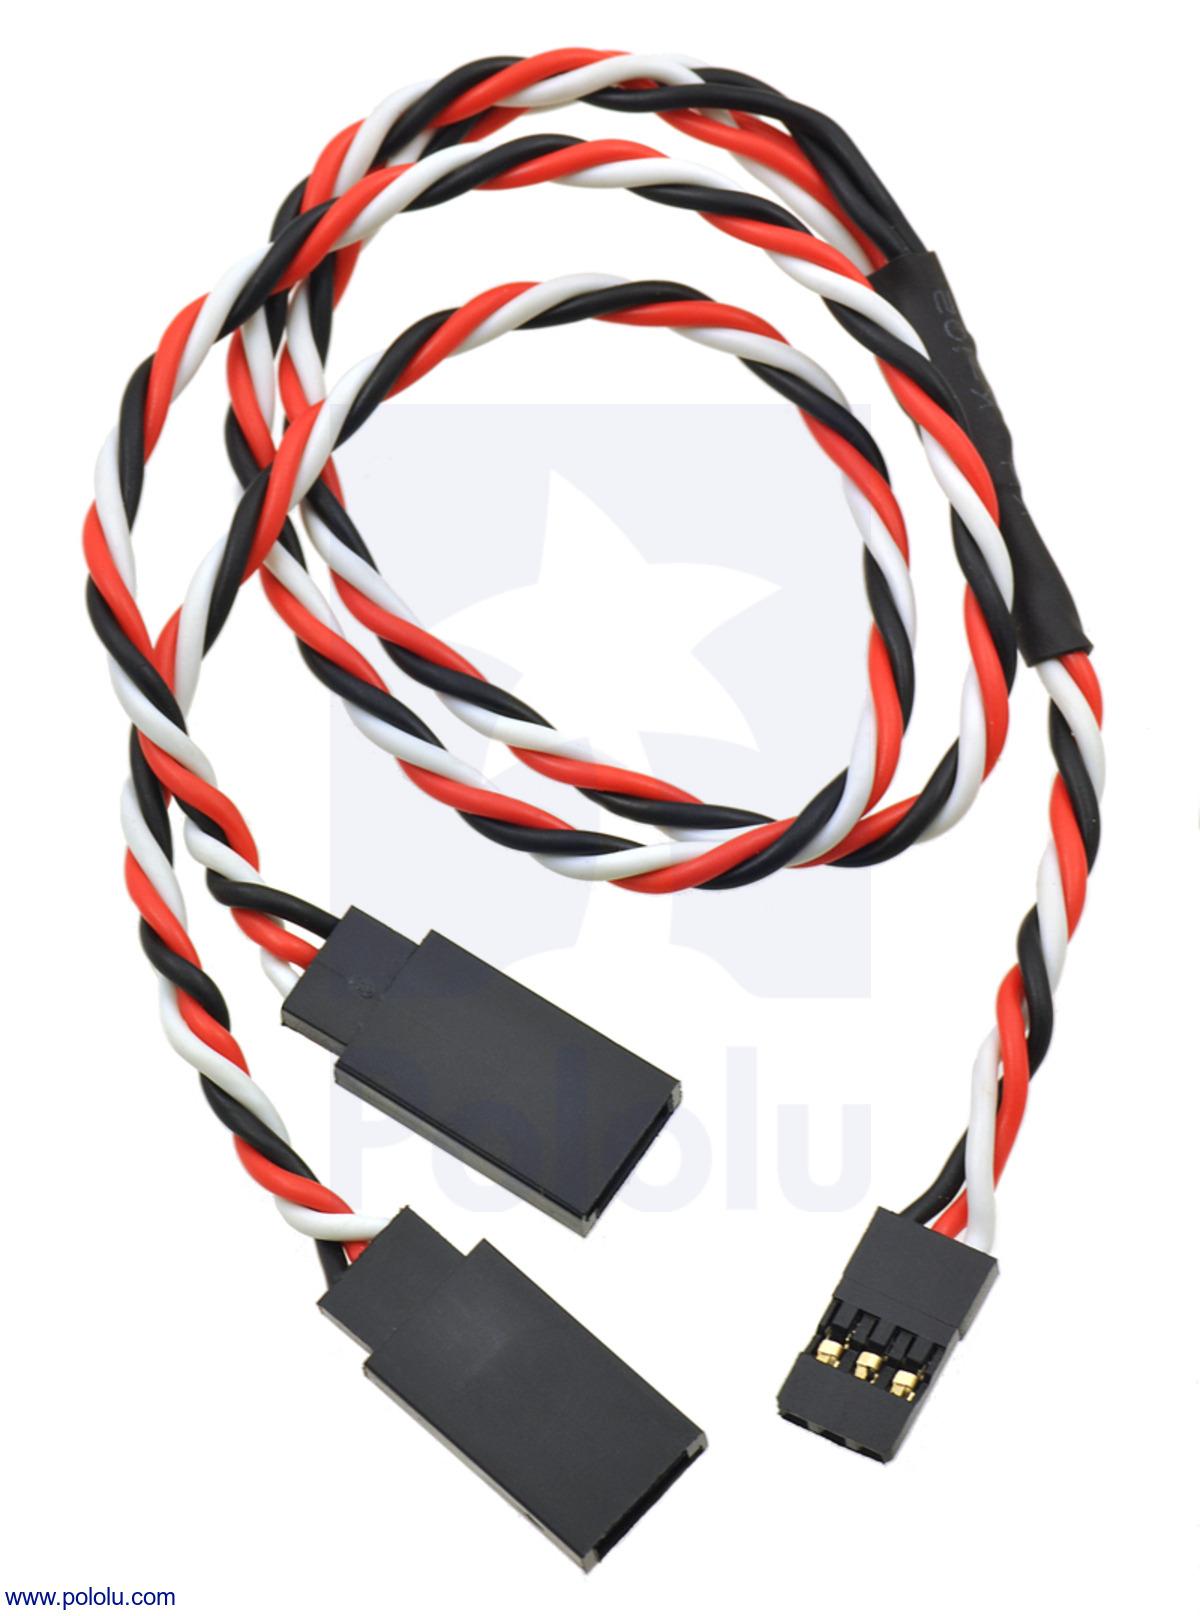 Pololu - Servo Cables